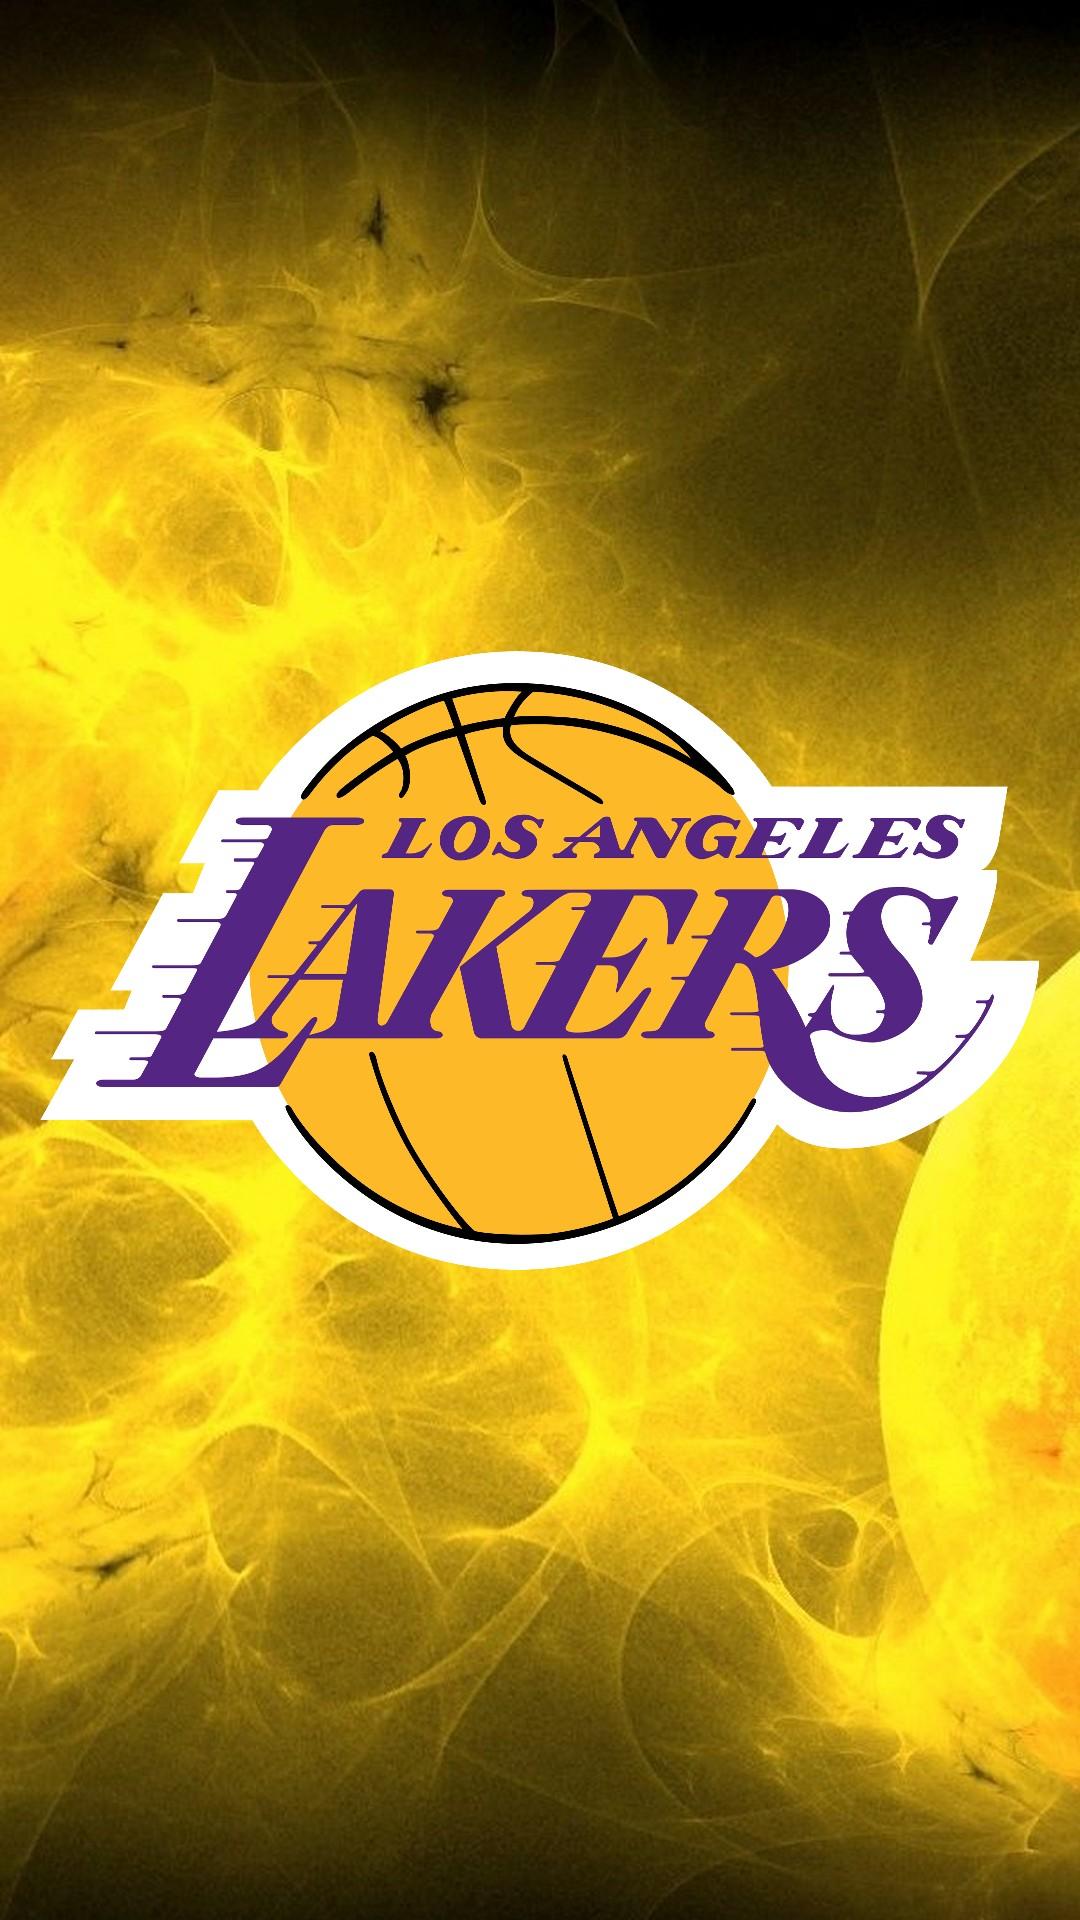 Lakers iPhone Screen Lock Wallpaper   2020 NBA iPhone Wallpaper 1080x1920